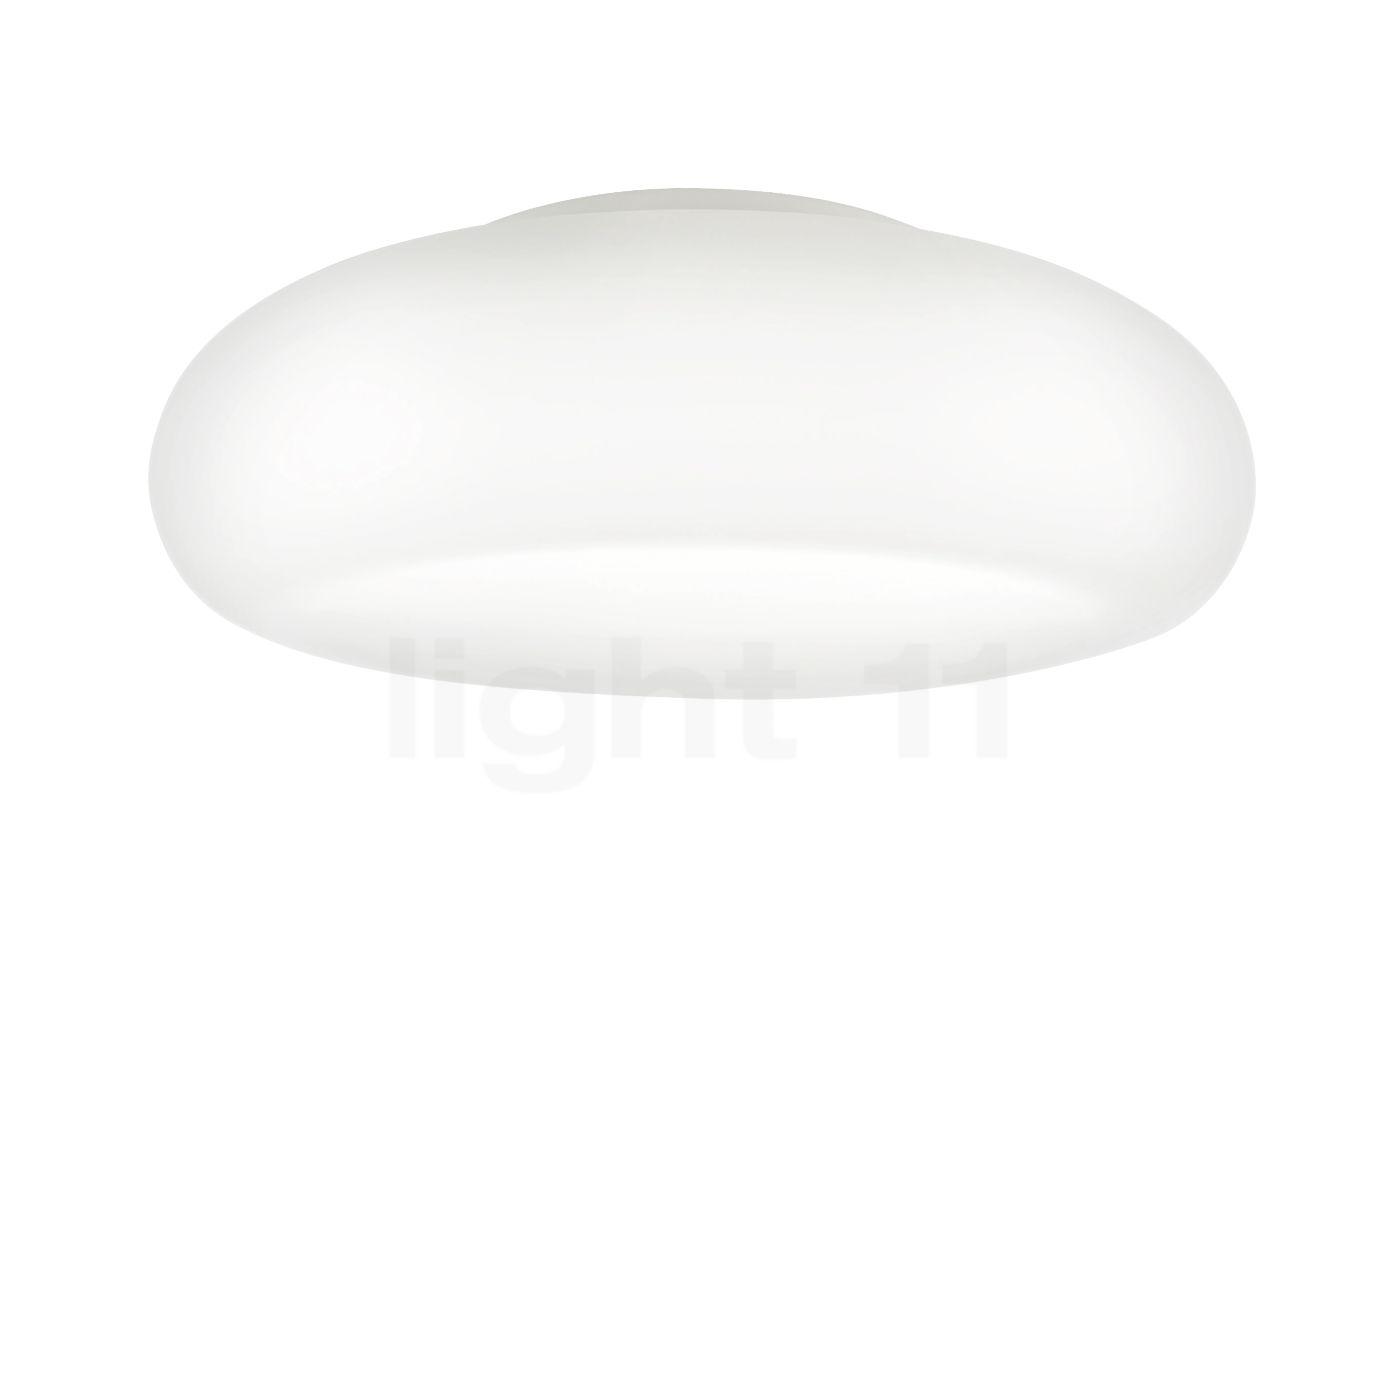 philips mybathroom mist plafonnier en vente sur. Black Bedroom Furniture Sets. Home Design Ideas